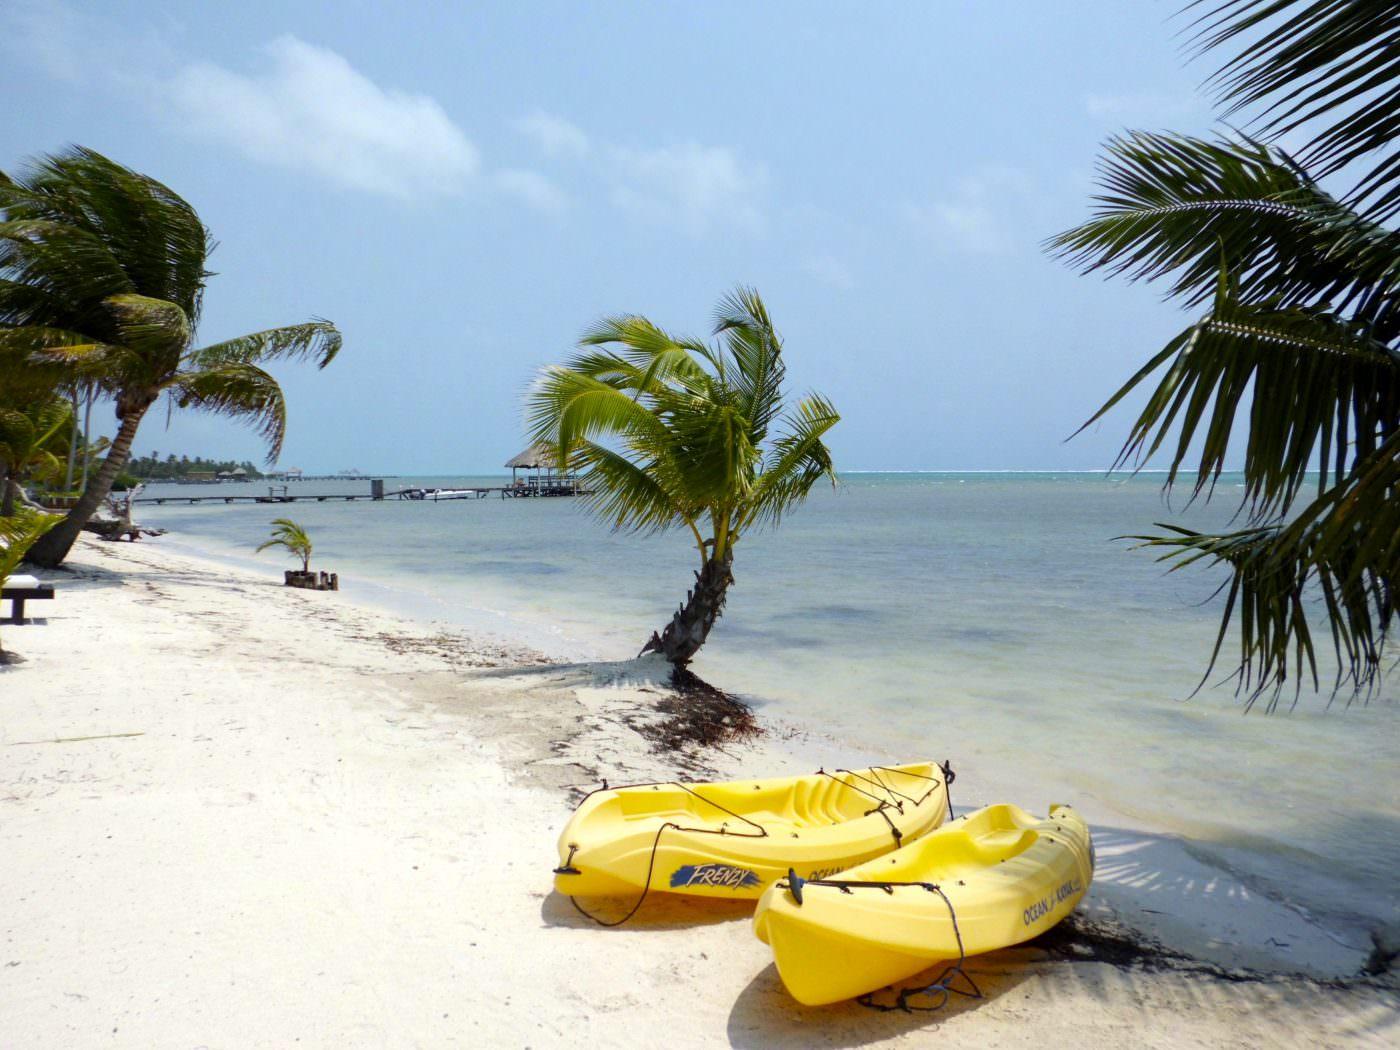 San Pedro, Belize. Travelling solo in Belize